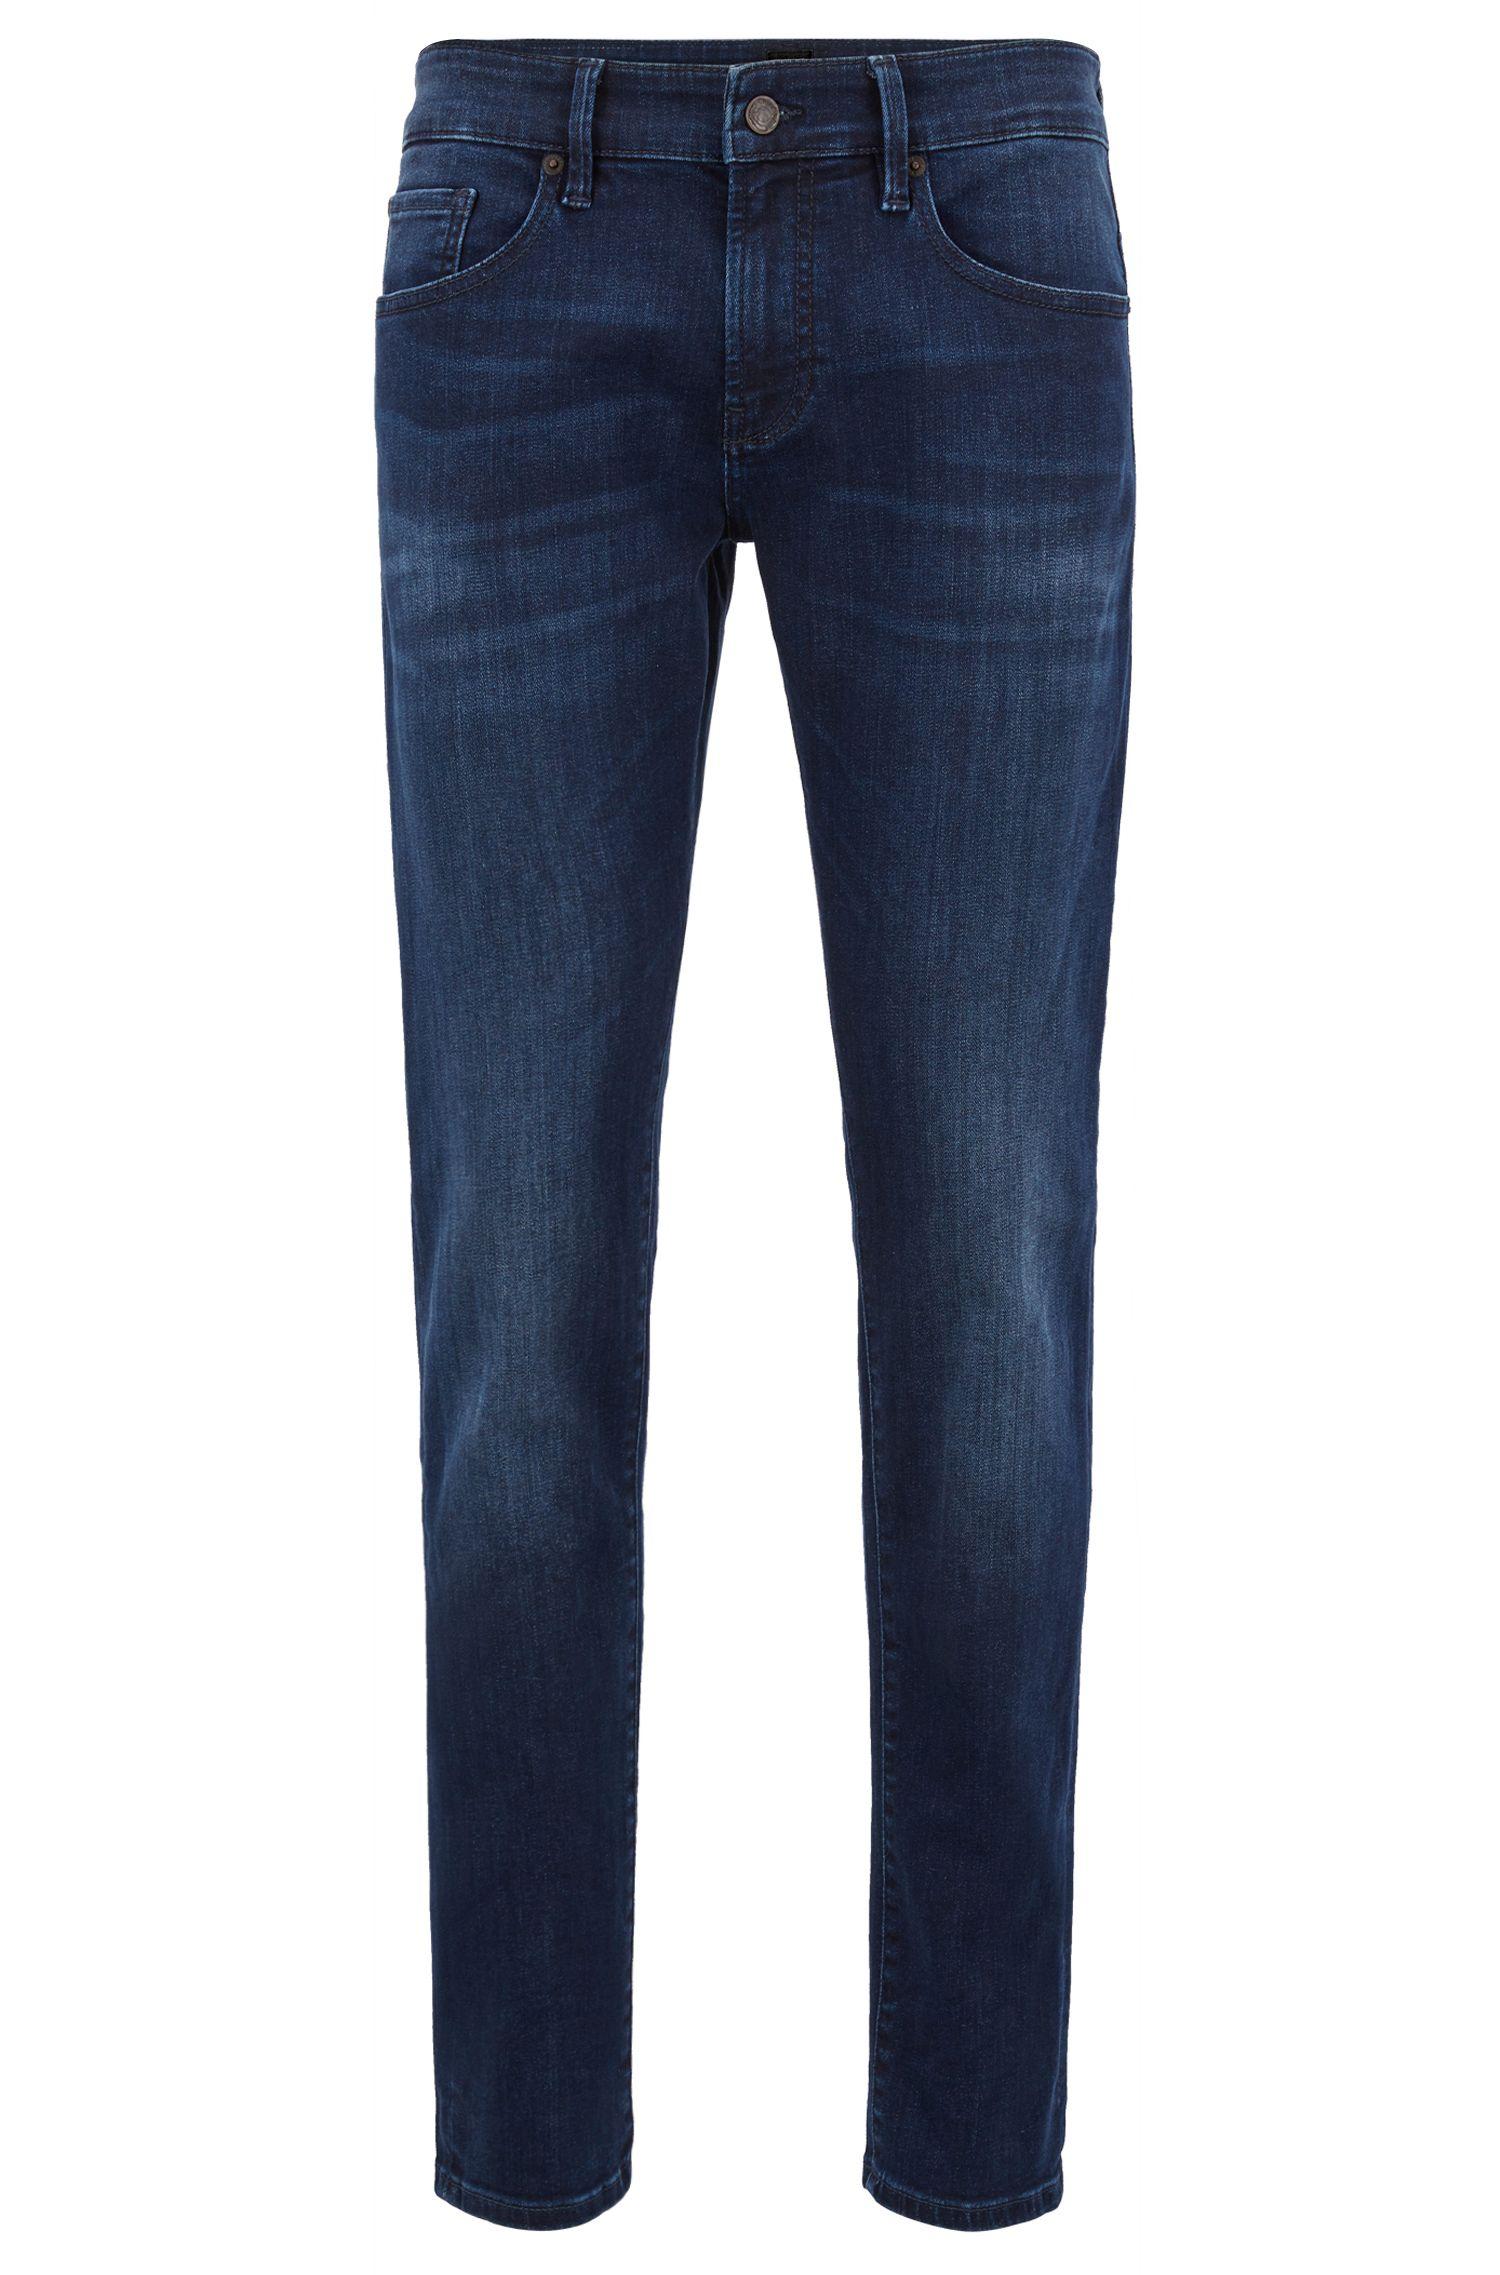 Jeans Skinny Fit délavé en stretch